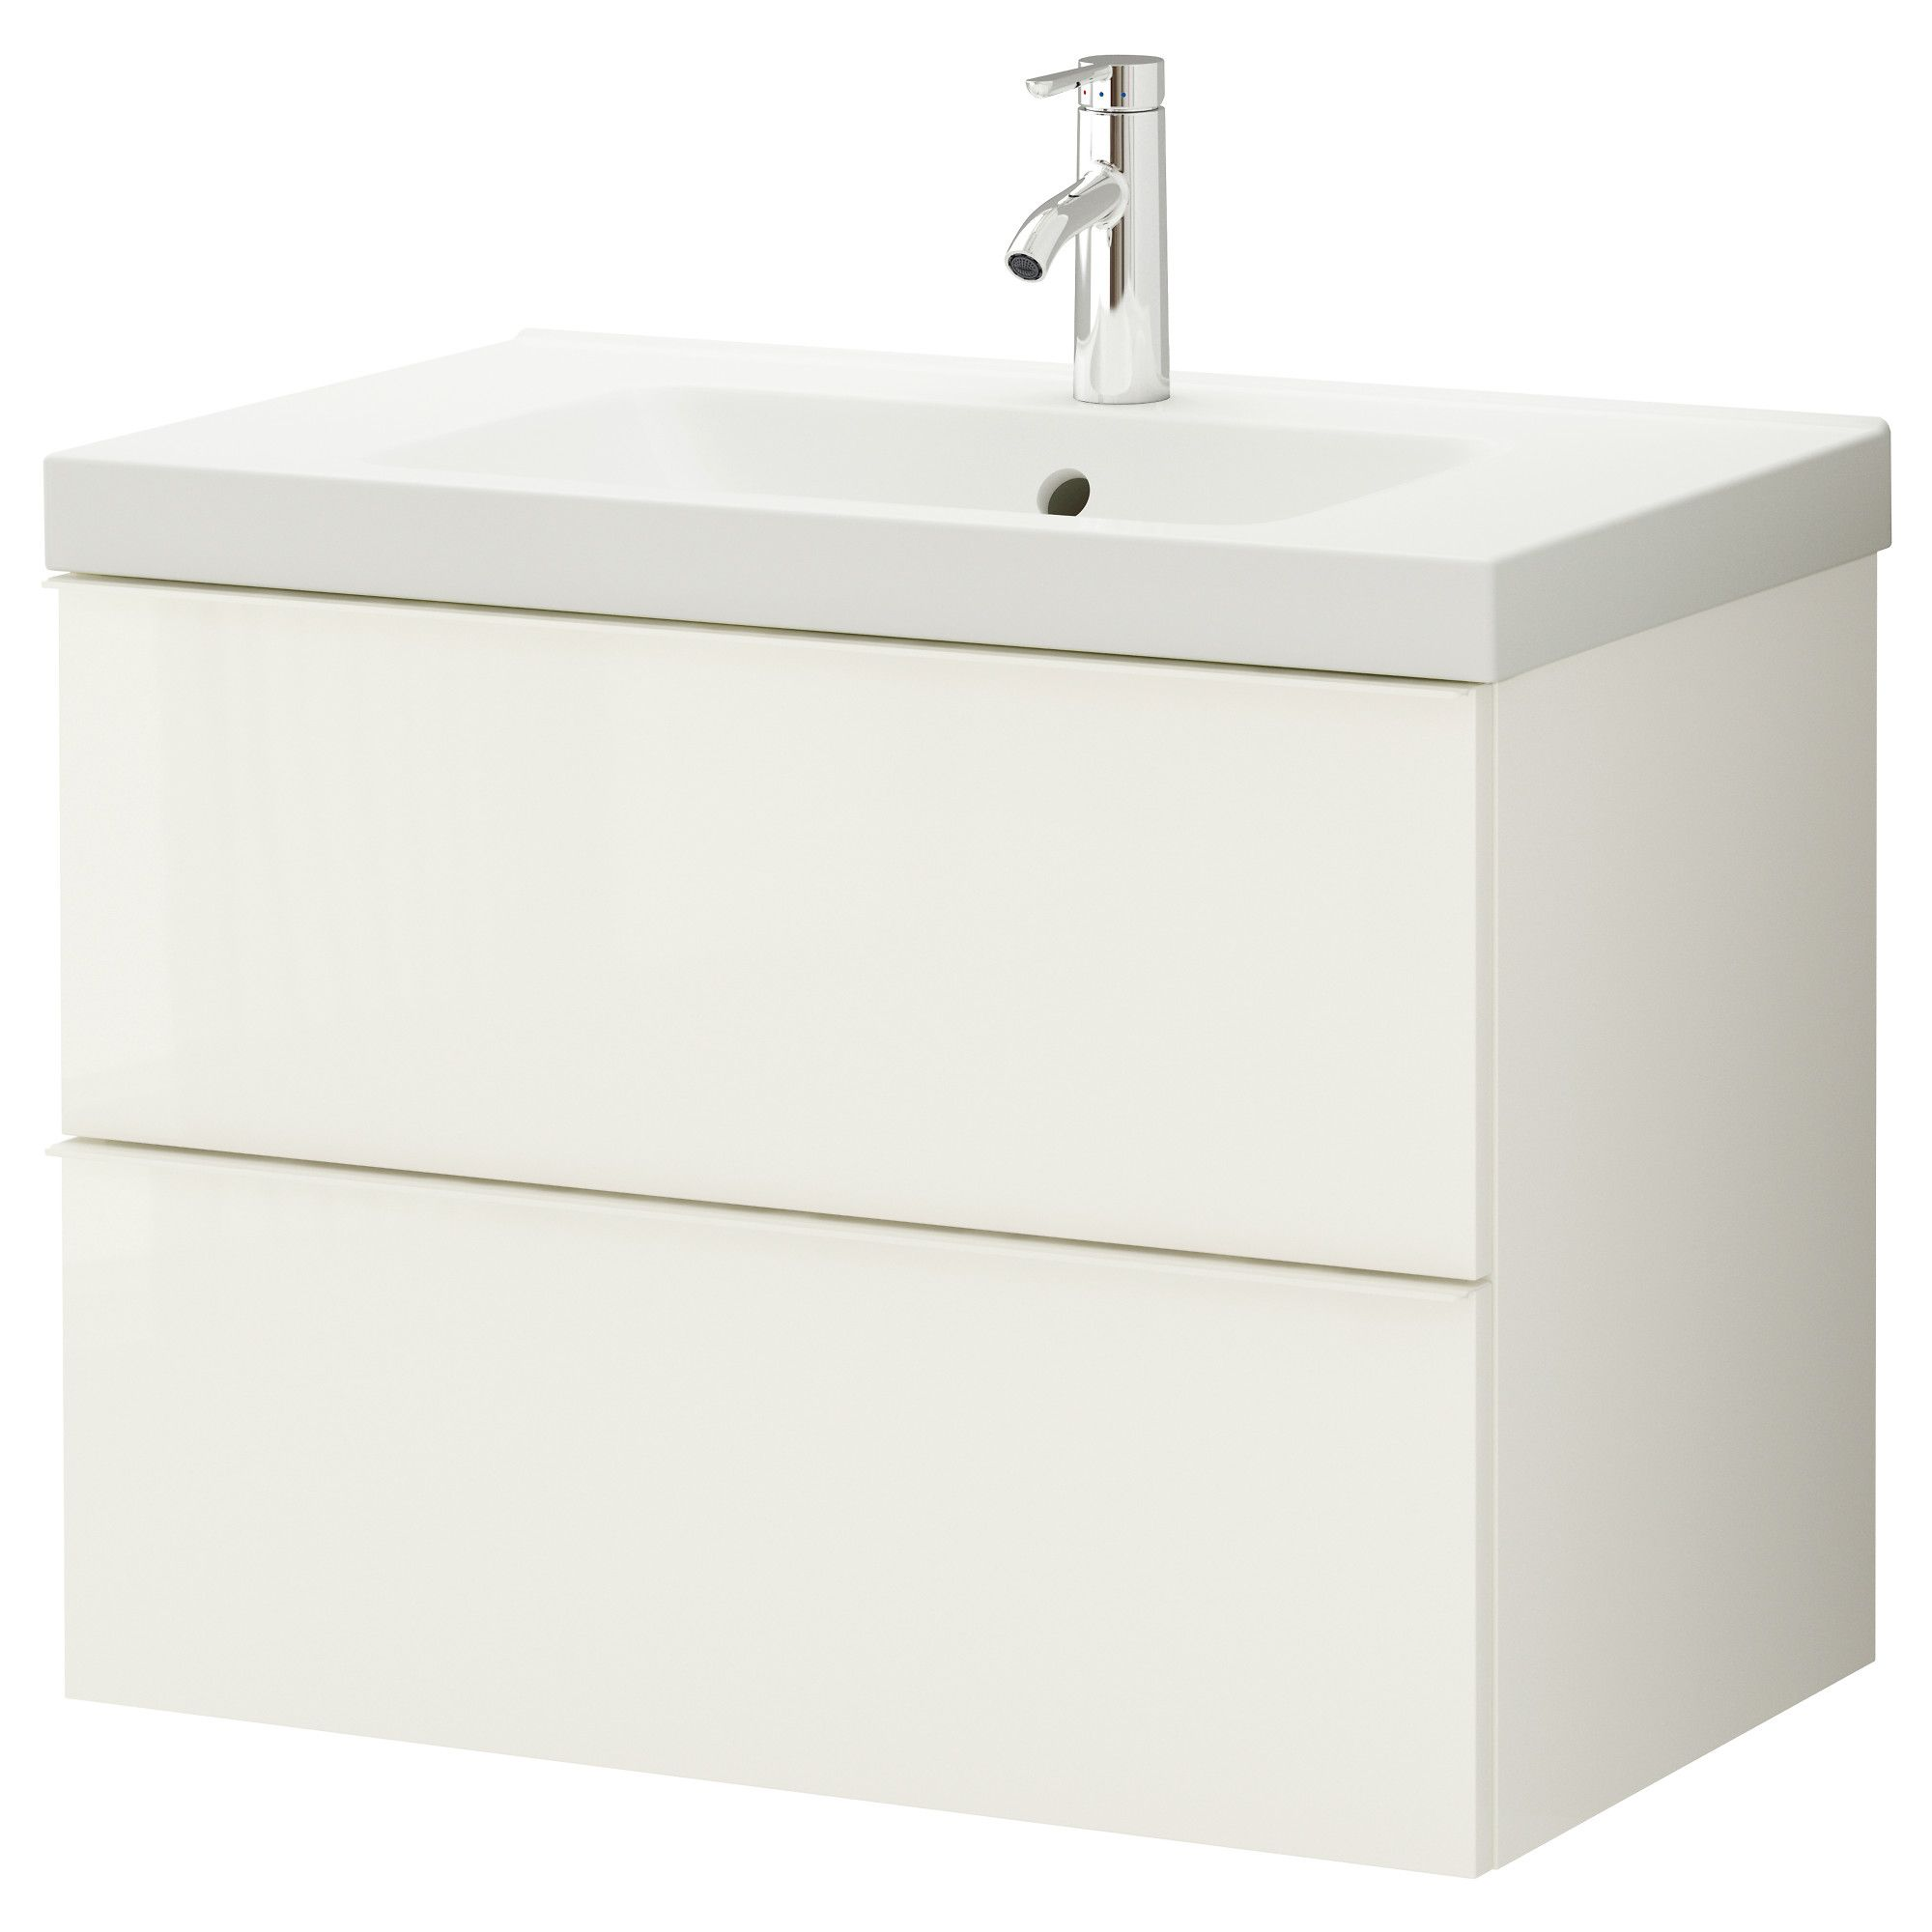 Ikea Godmorgon Drawers And Odensvik Basin Ikea Bathroom Vanity Units Bathroom Vanity Units Wash Stand